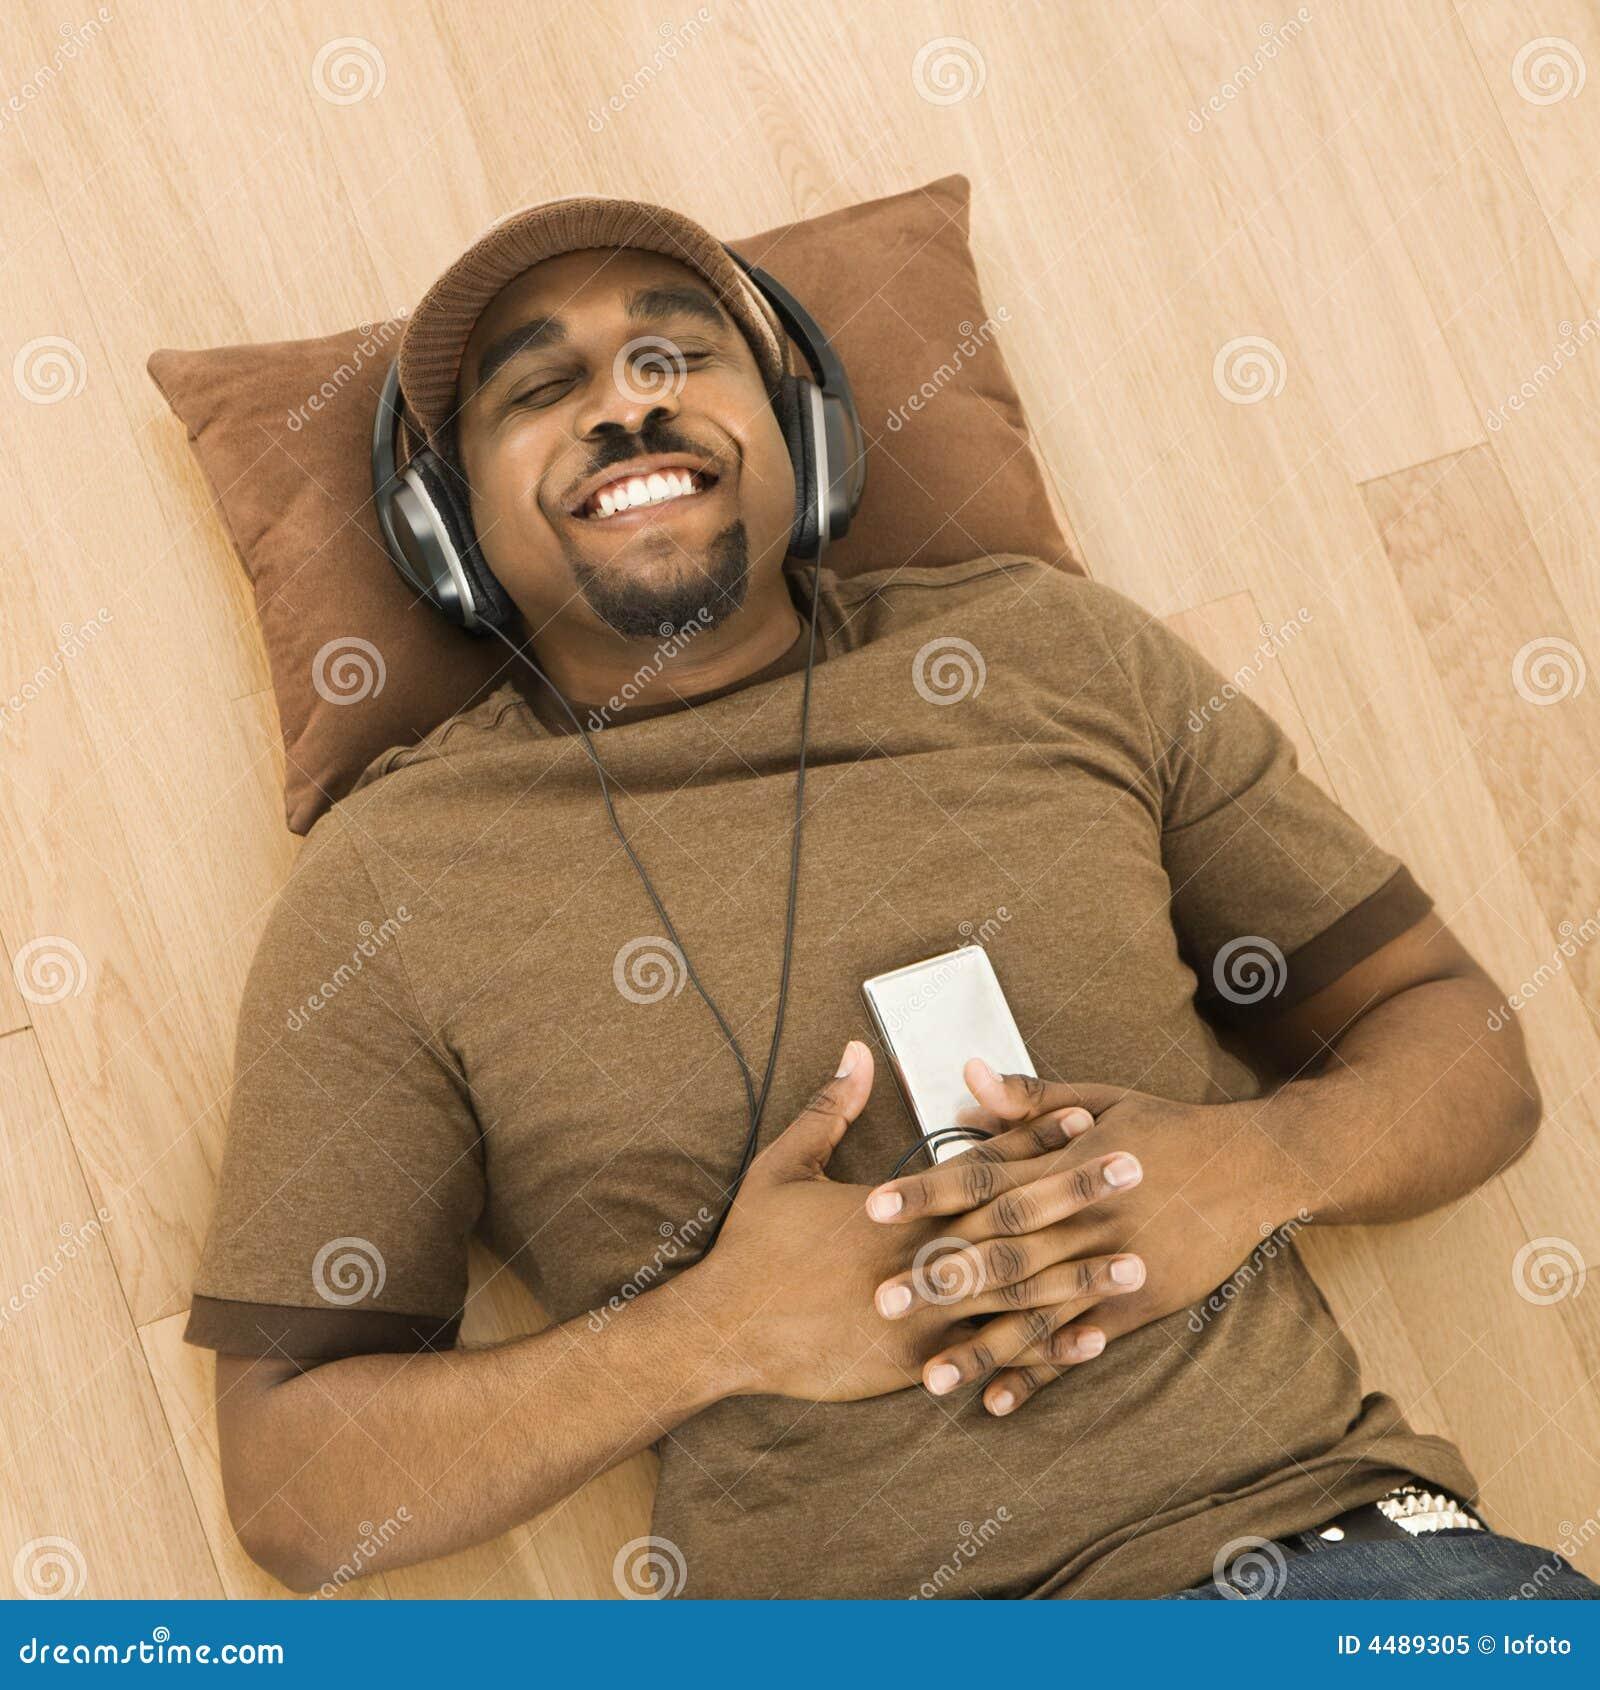 Man relaxing to music.